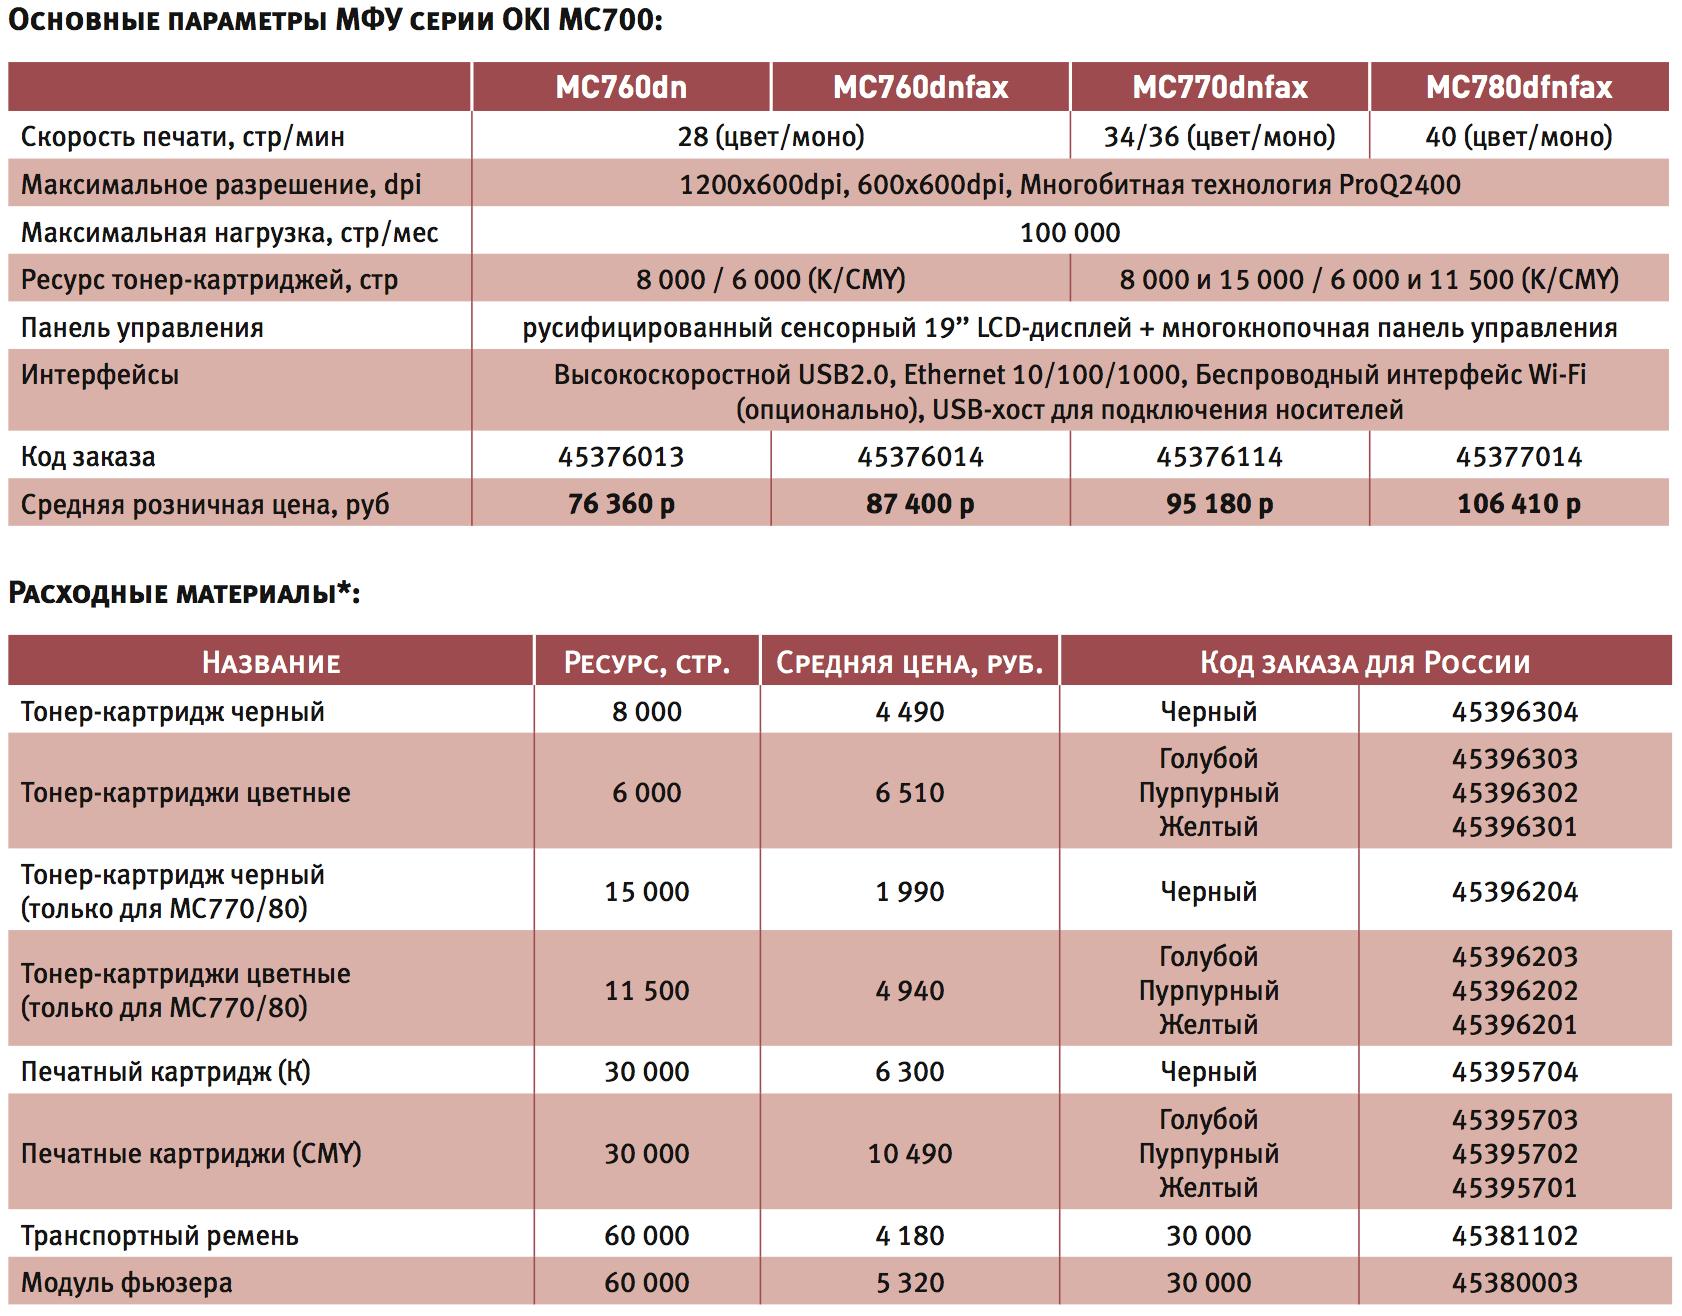 технические характеристики OKI MC770